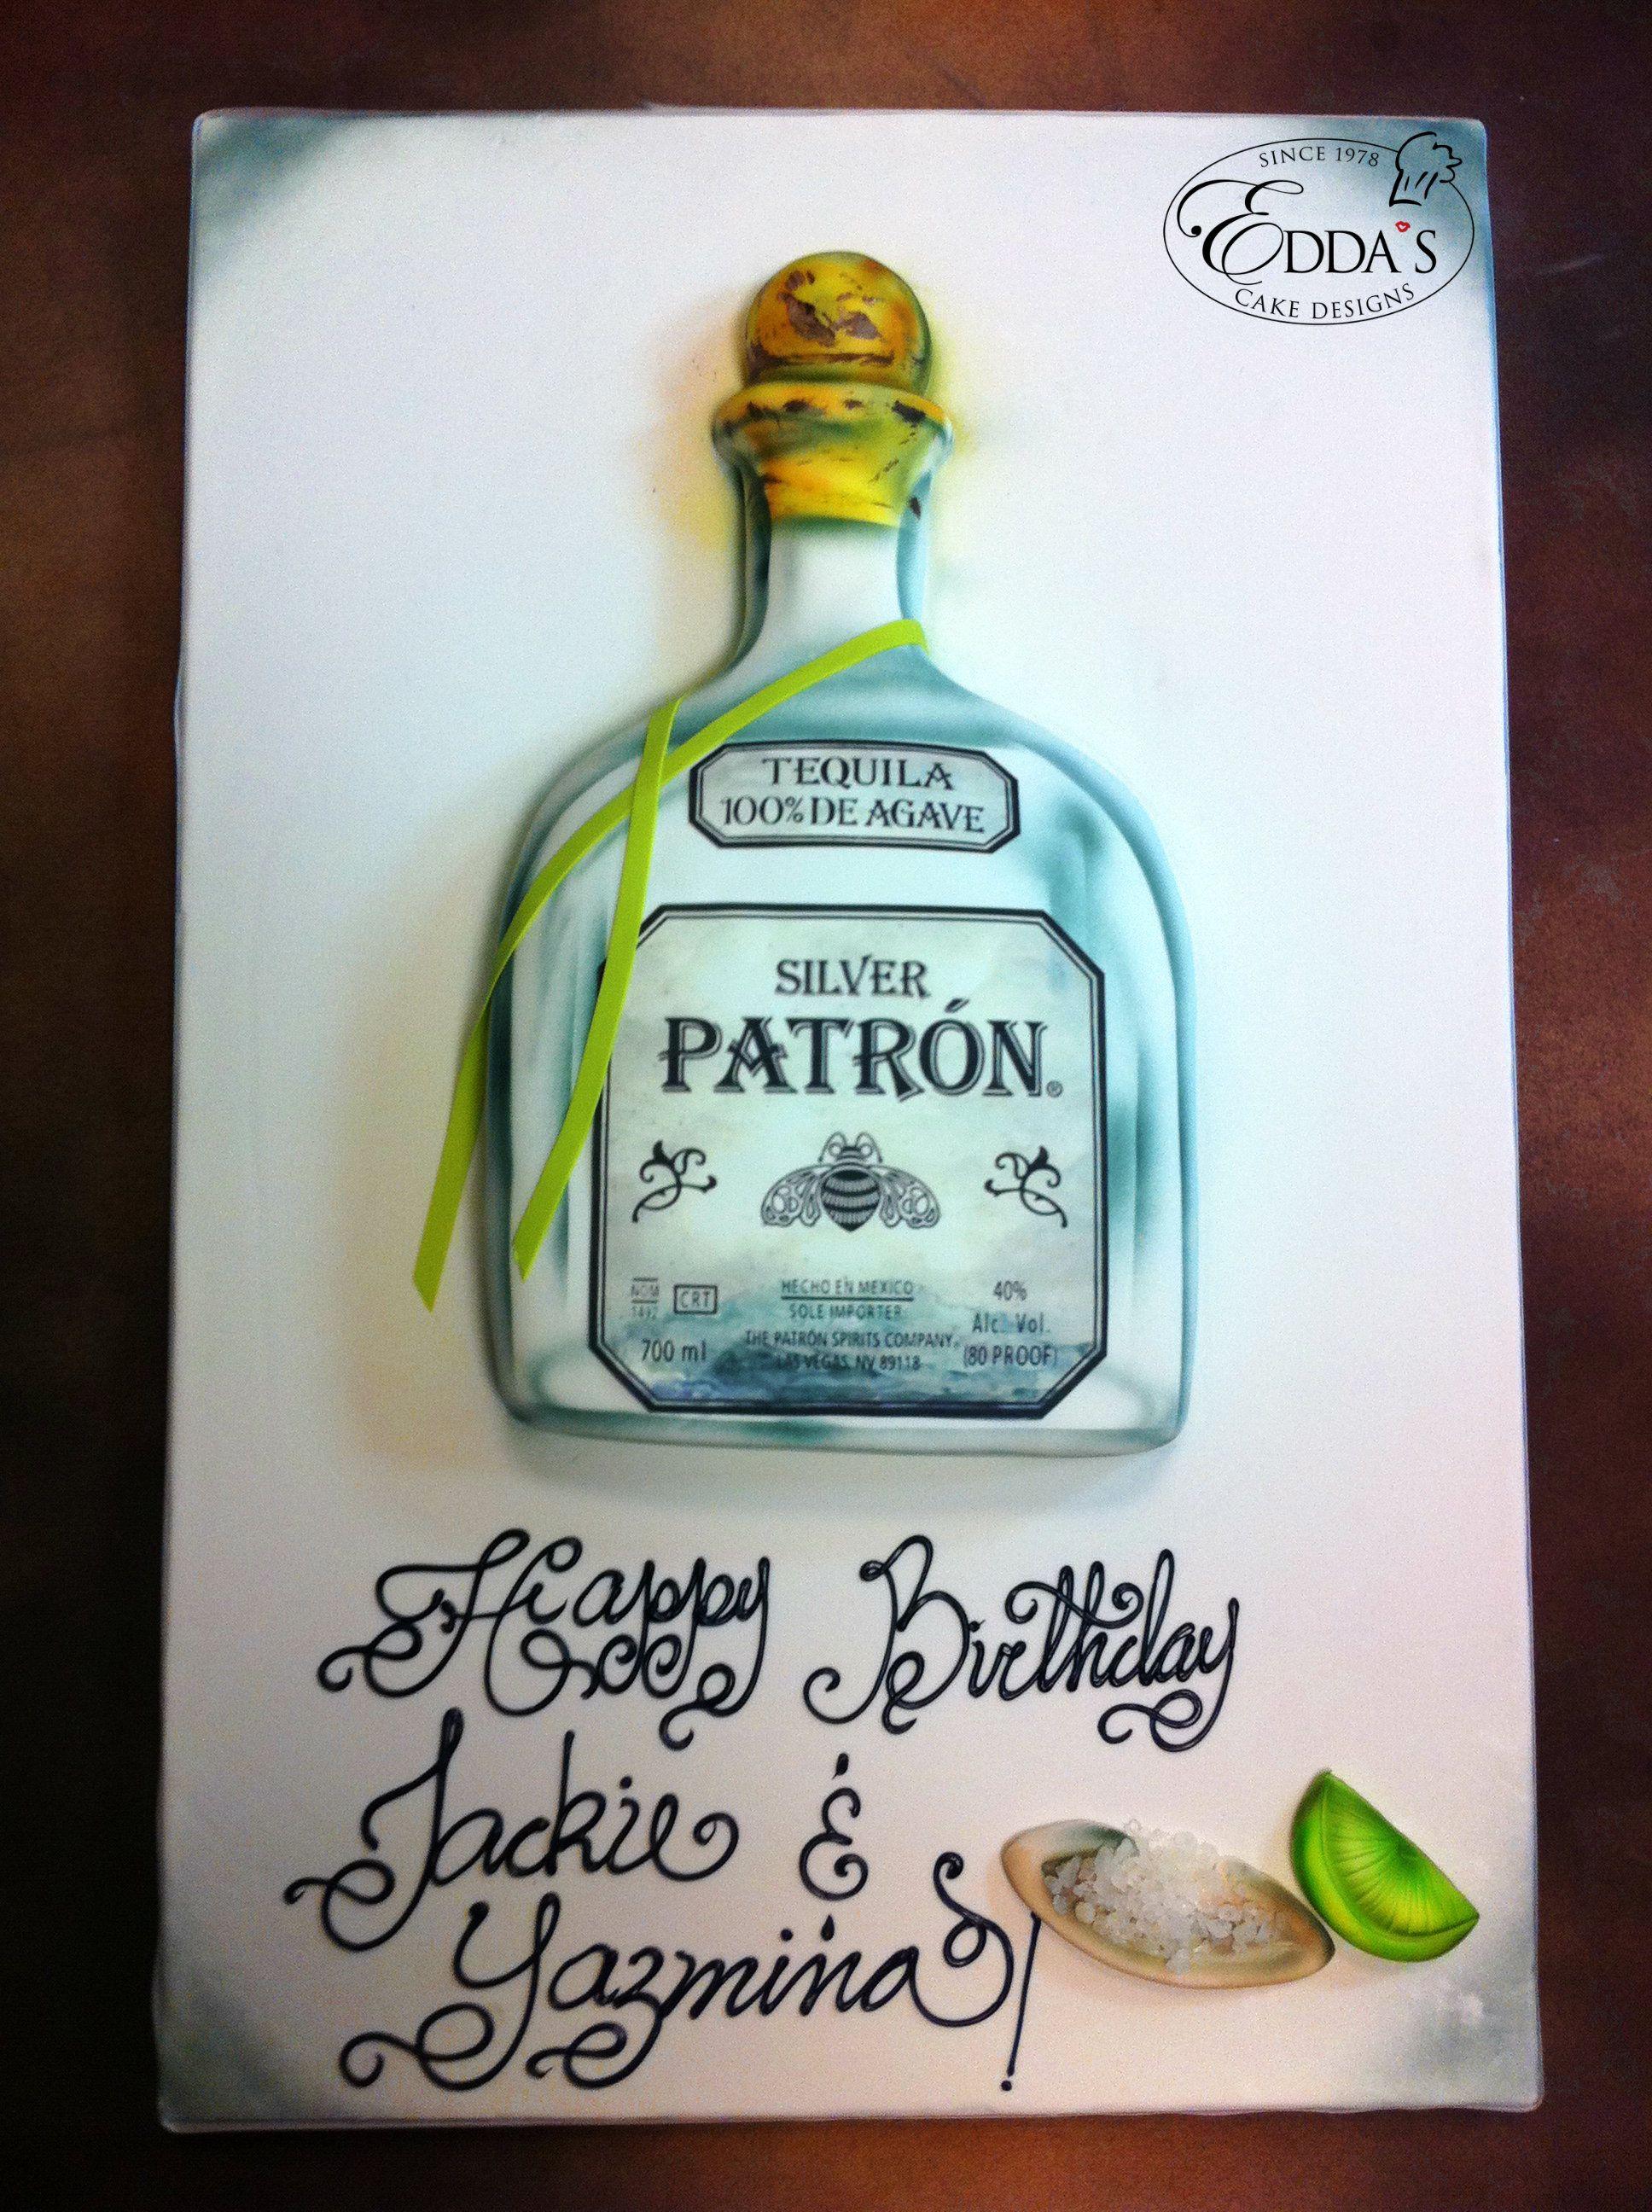 Patron Tequila Birthday Cake Httpwwweddascakedesignscom - Patron birthday cake